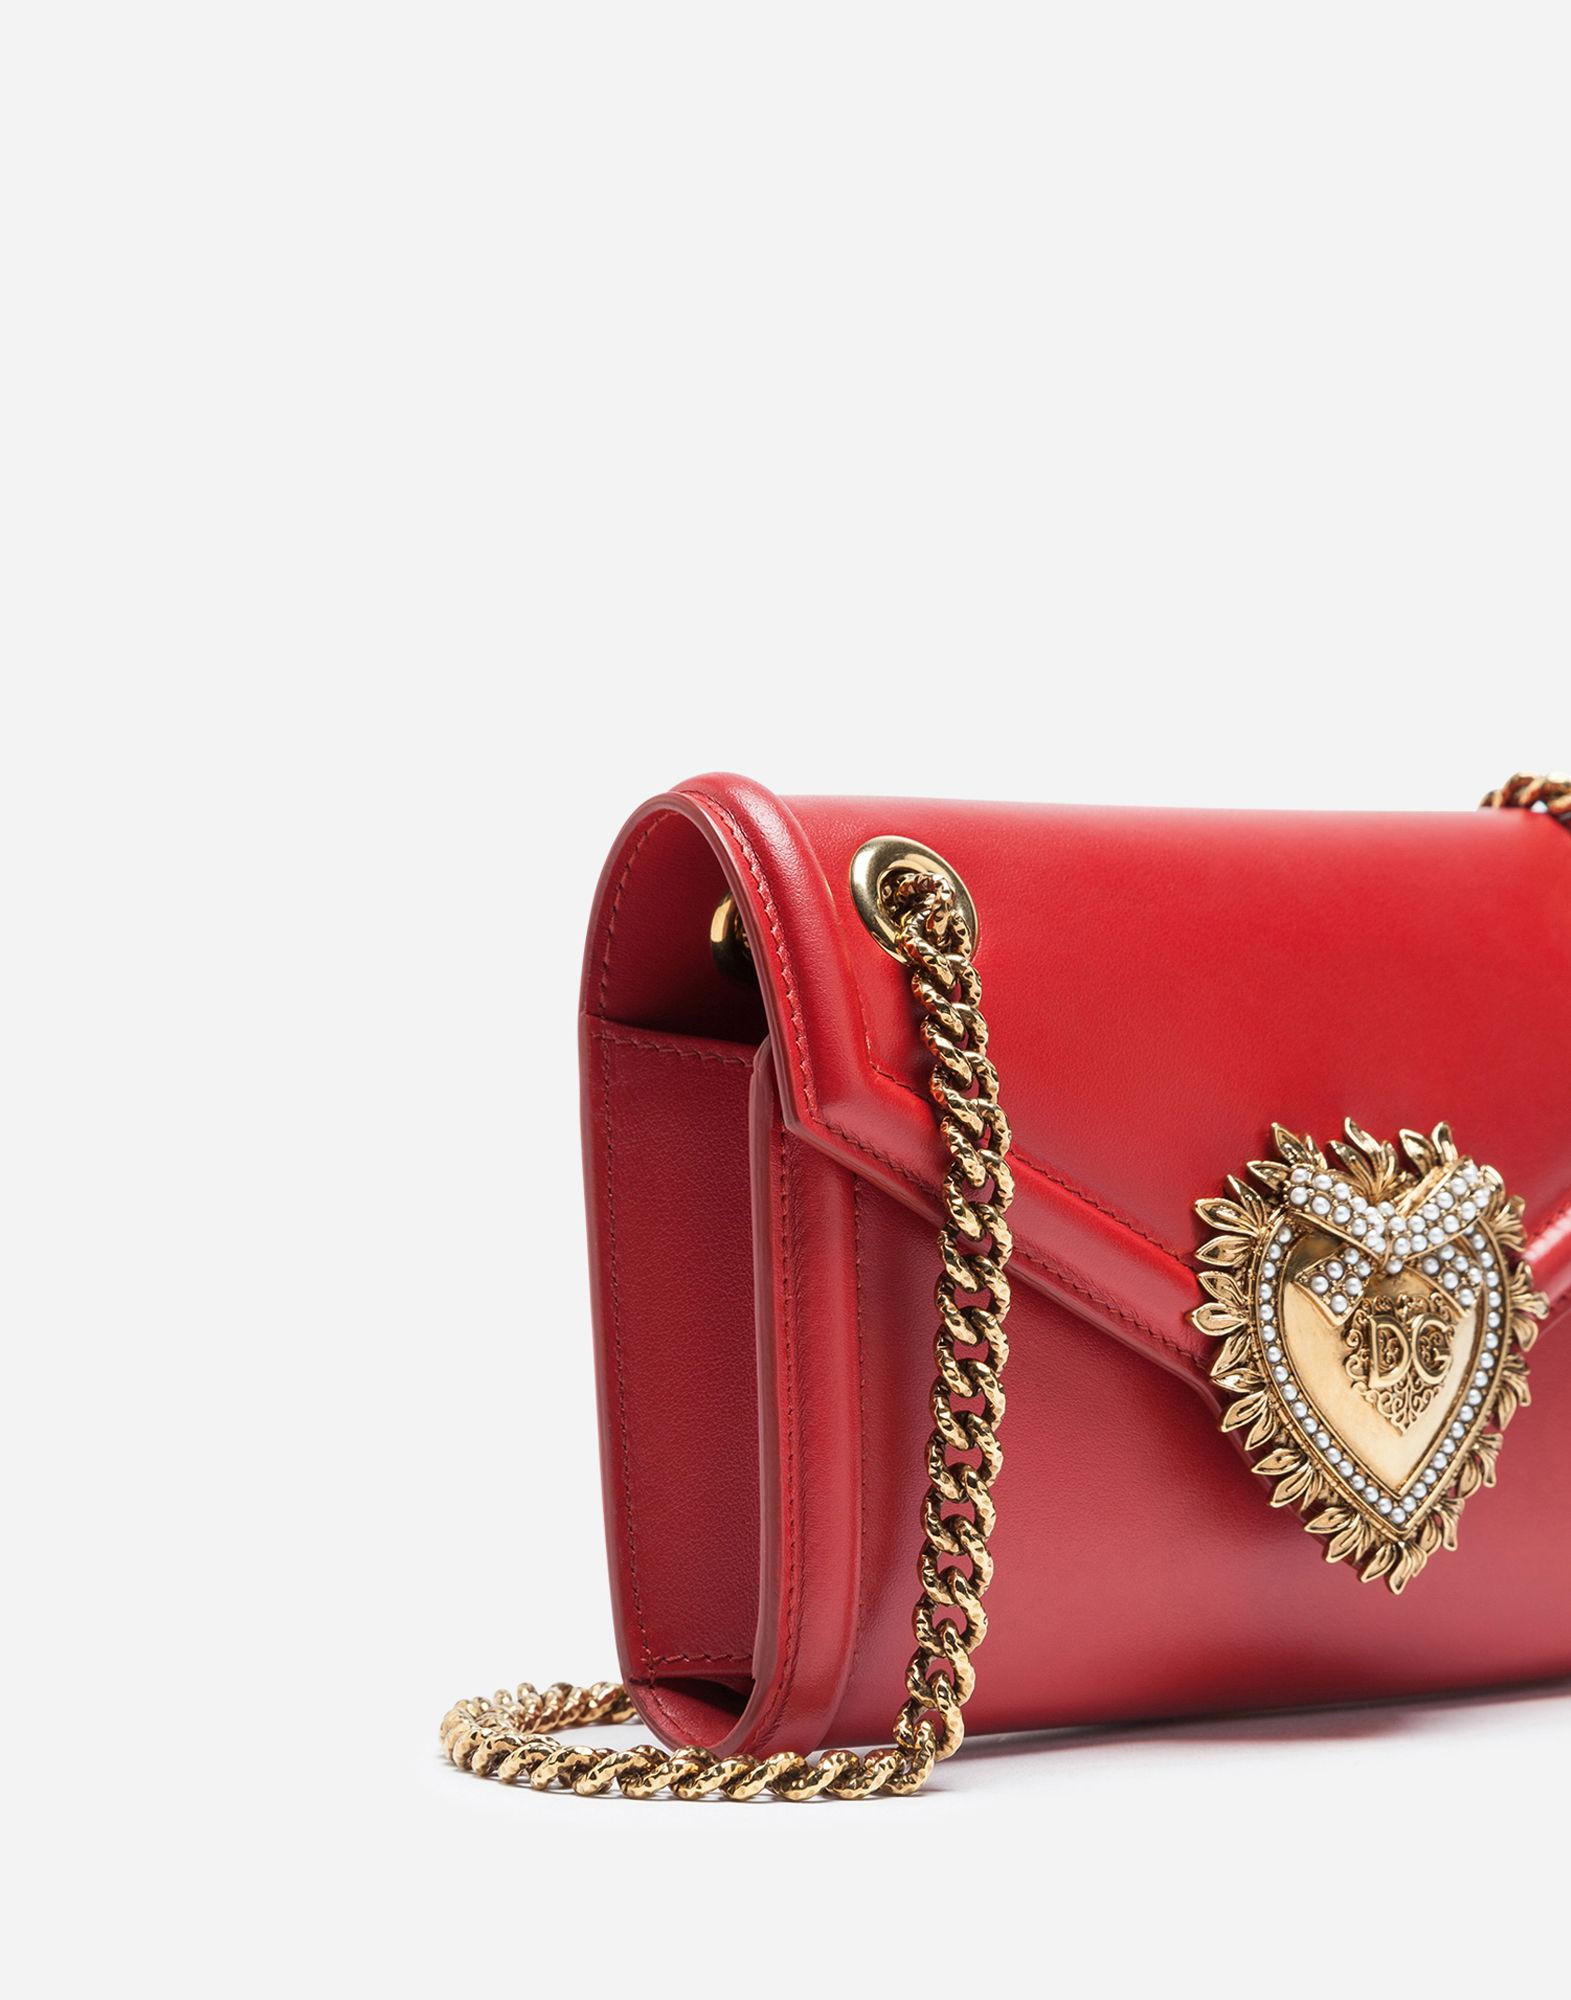 08942a566361 Lyst - Dolce   Gabbana Mini Devotion Bag In Smooth Calfskin in Red